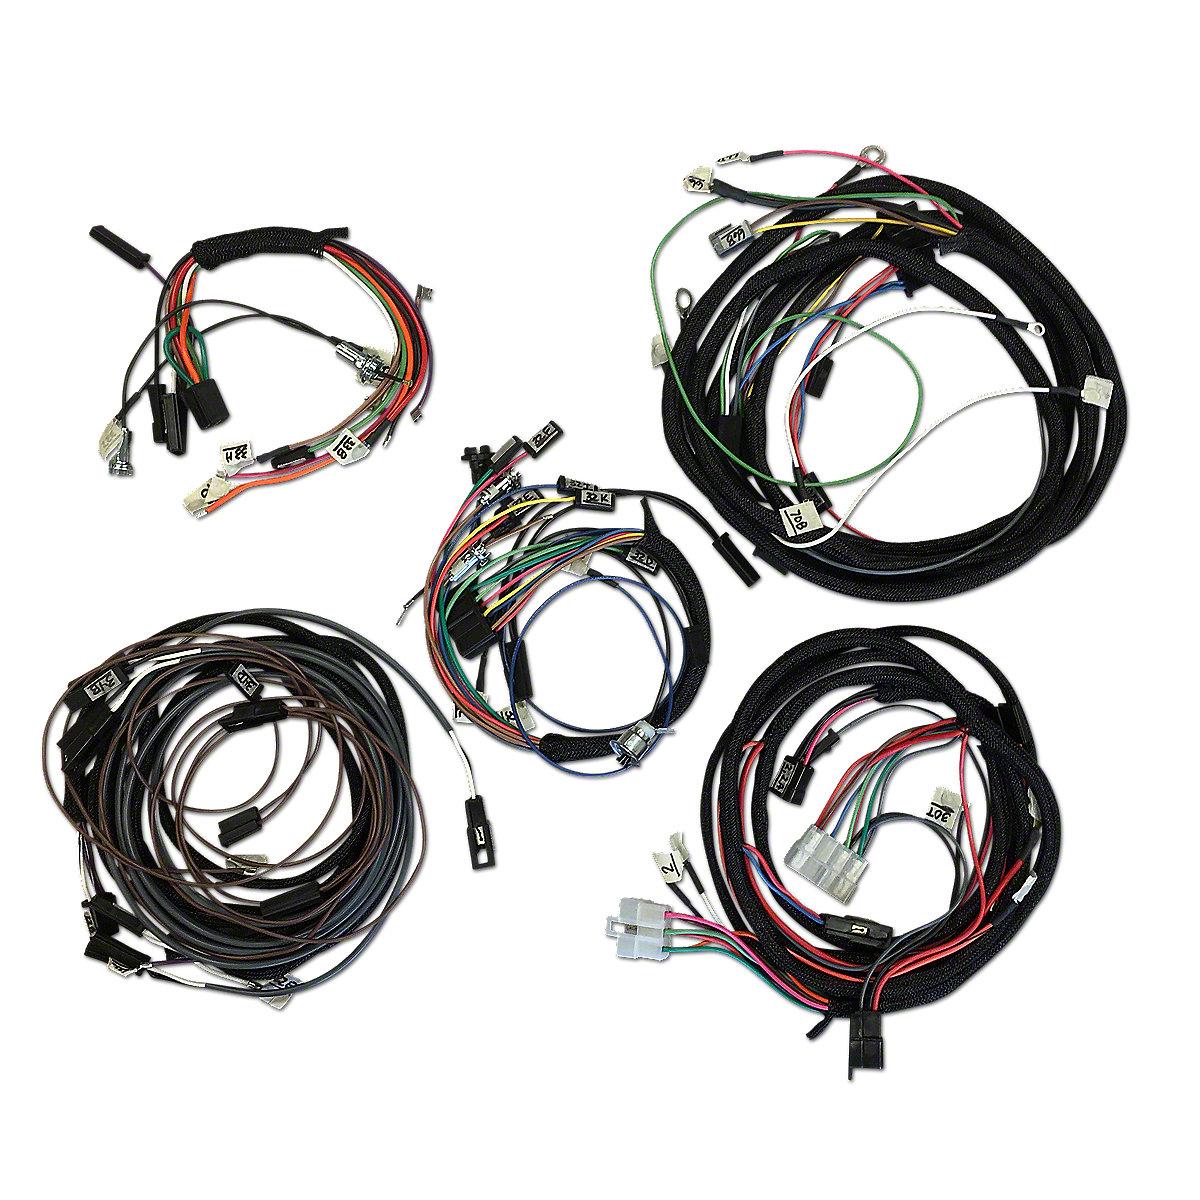 Restoration Quality Wiring Harness Ihs3543 Mf 240